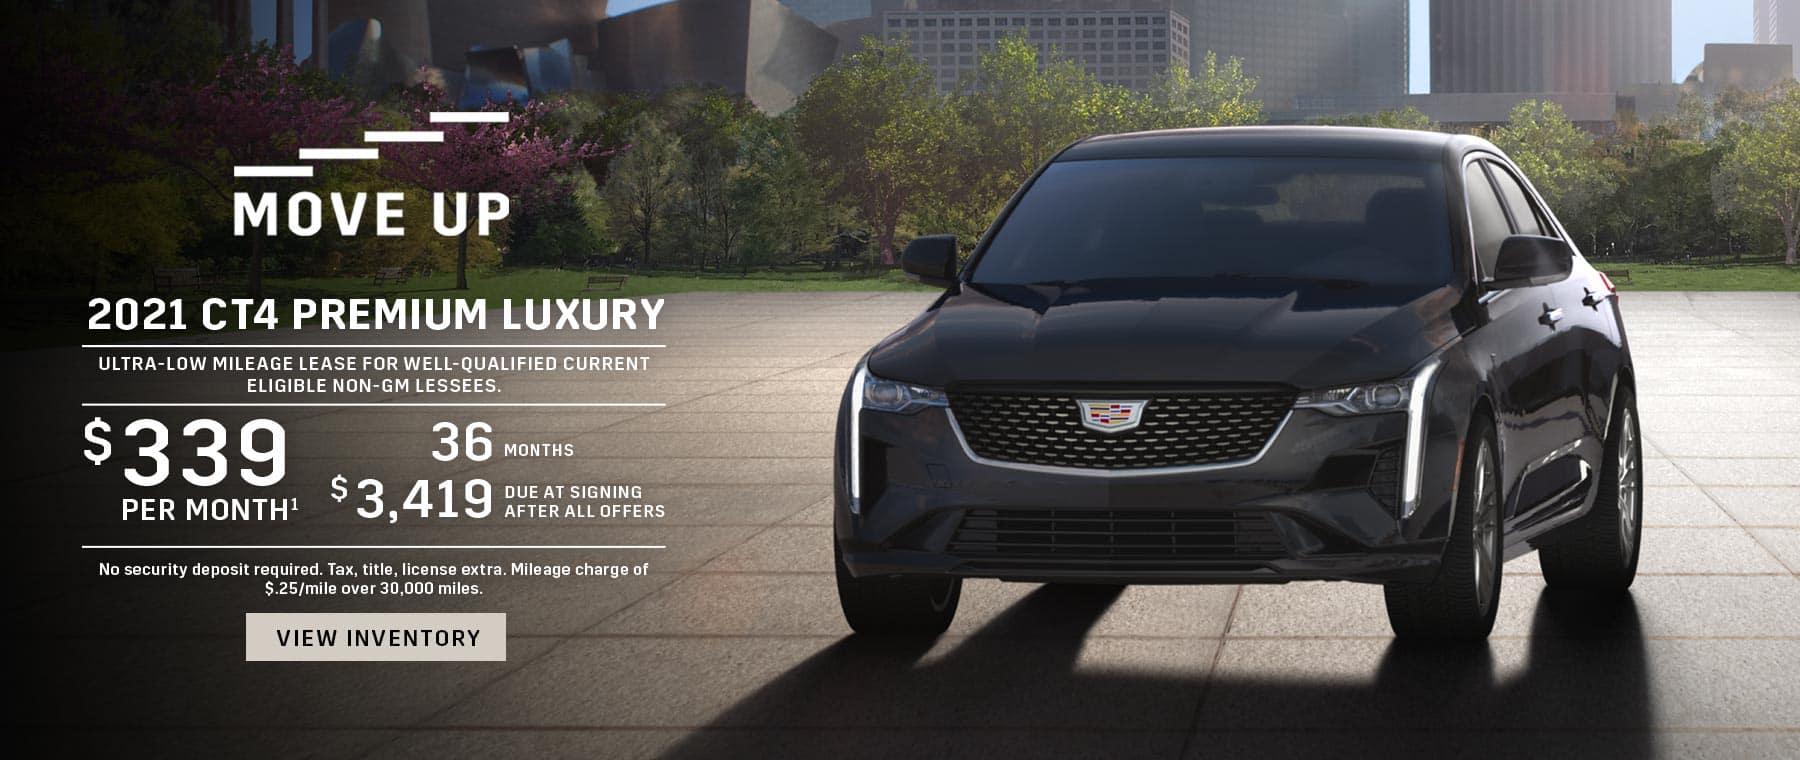 2021 Cadillac CT4 $339 / 36 months / $3,419 DAS